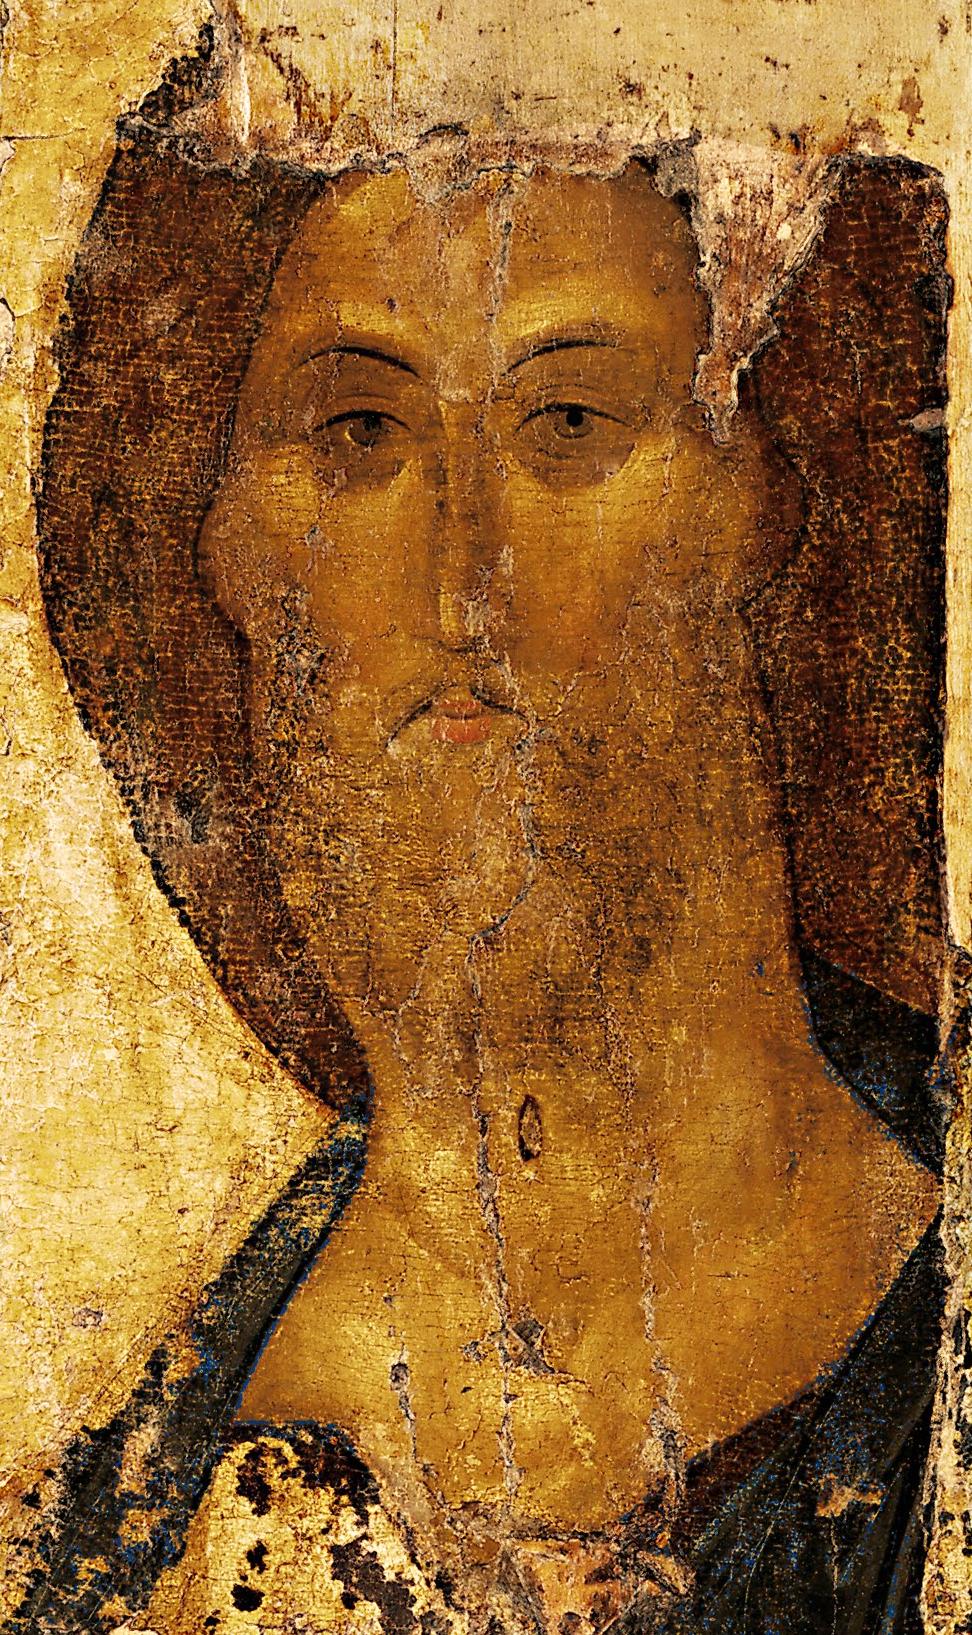 Kristus Isganytojas Andrei Rublev c. 1410